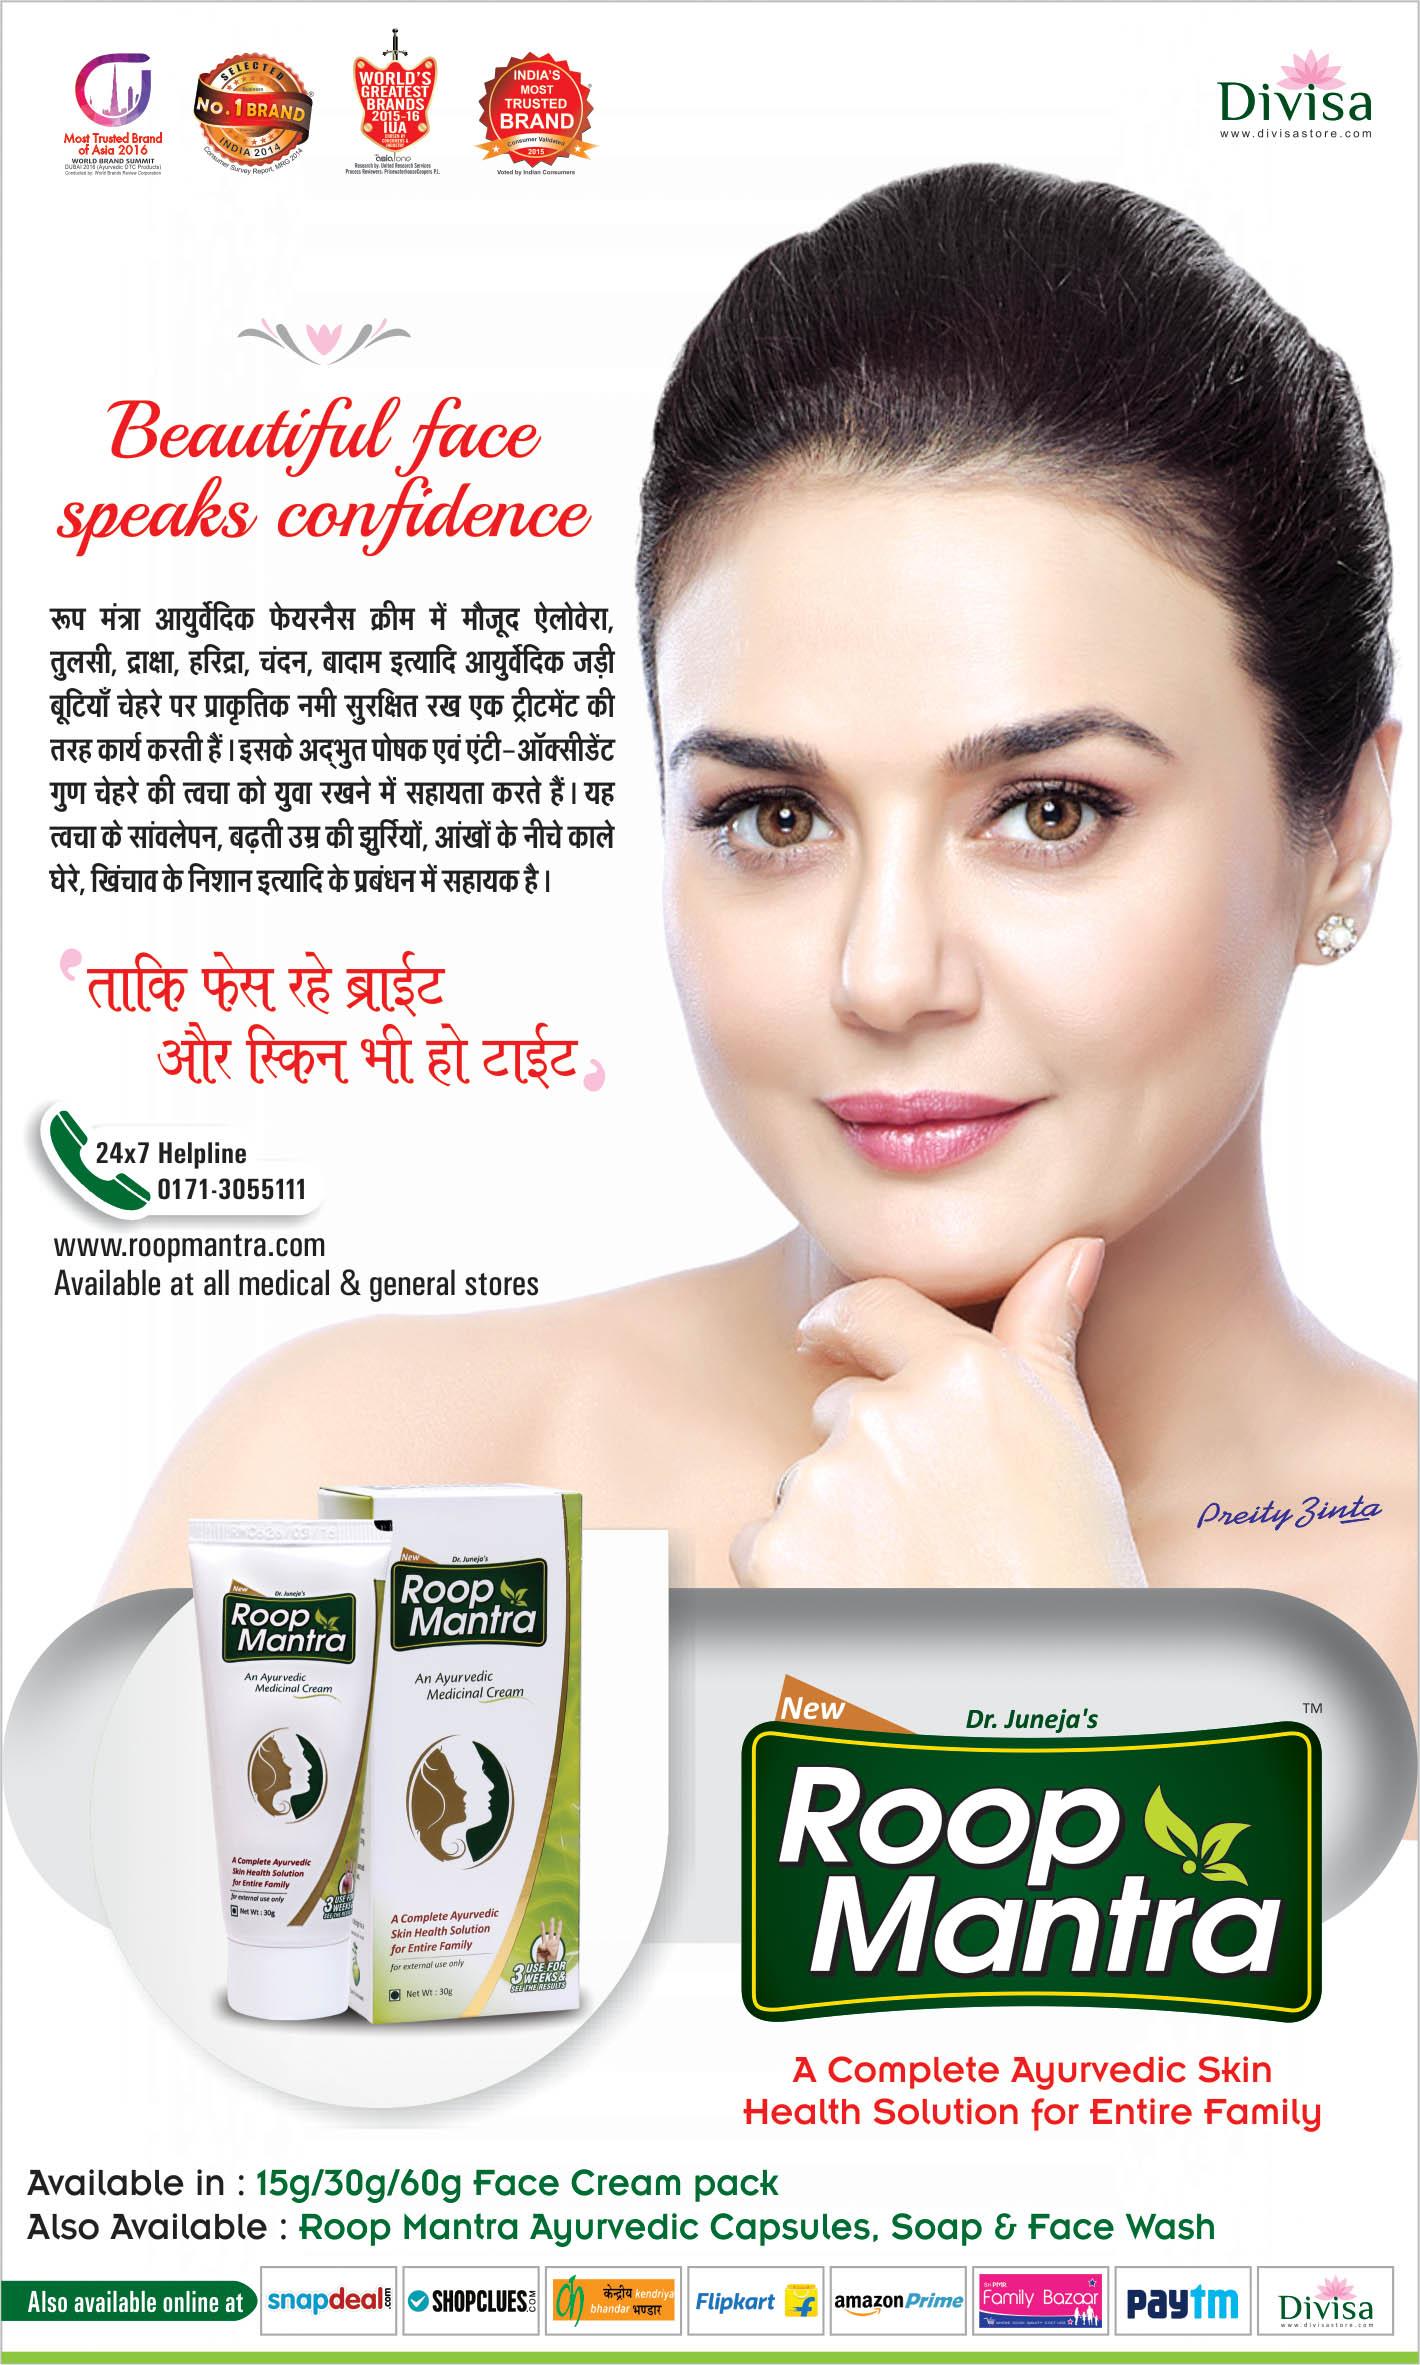 Roop Mantra Ayurvedic Tips for Oily Skin  Roop Mantra Blog - Skin